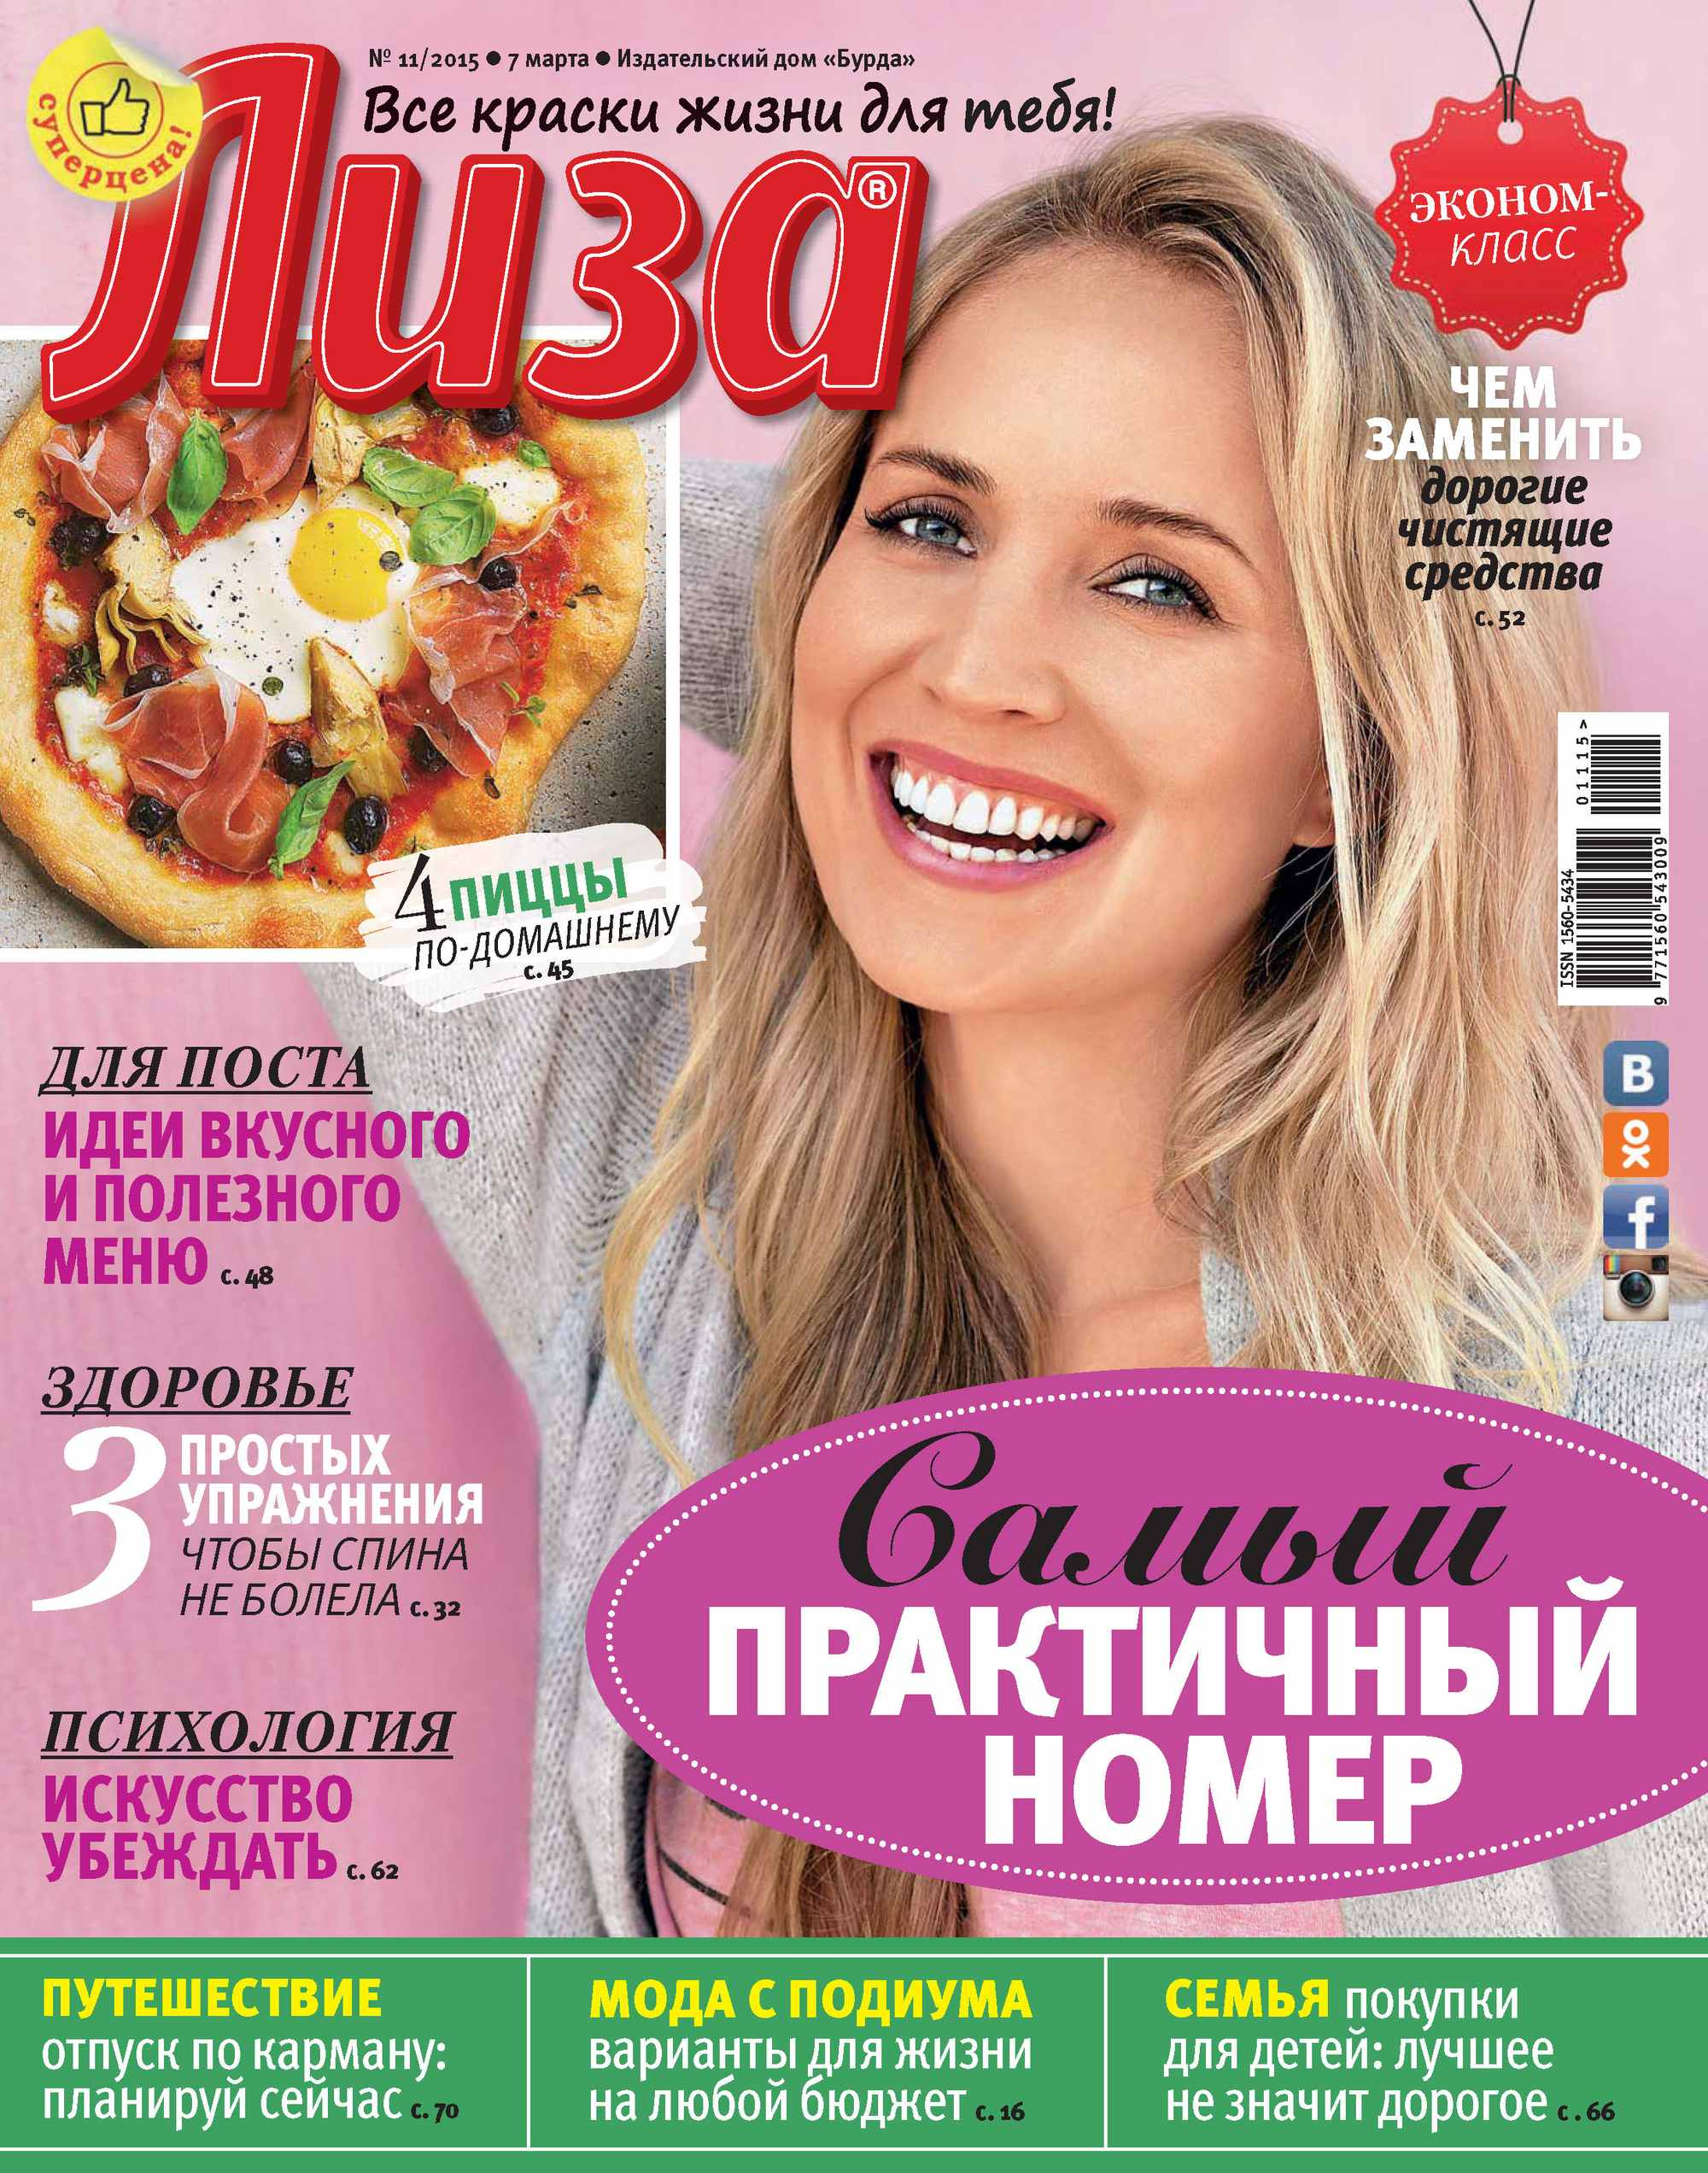 ИД «Бурда» Журнал «Лиза» №11/2015 ид бурда журнал лиза 34 2015